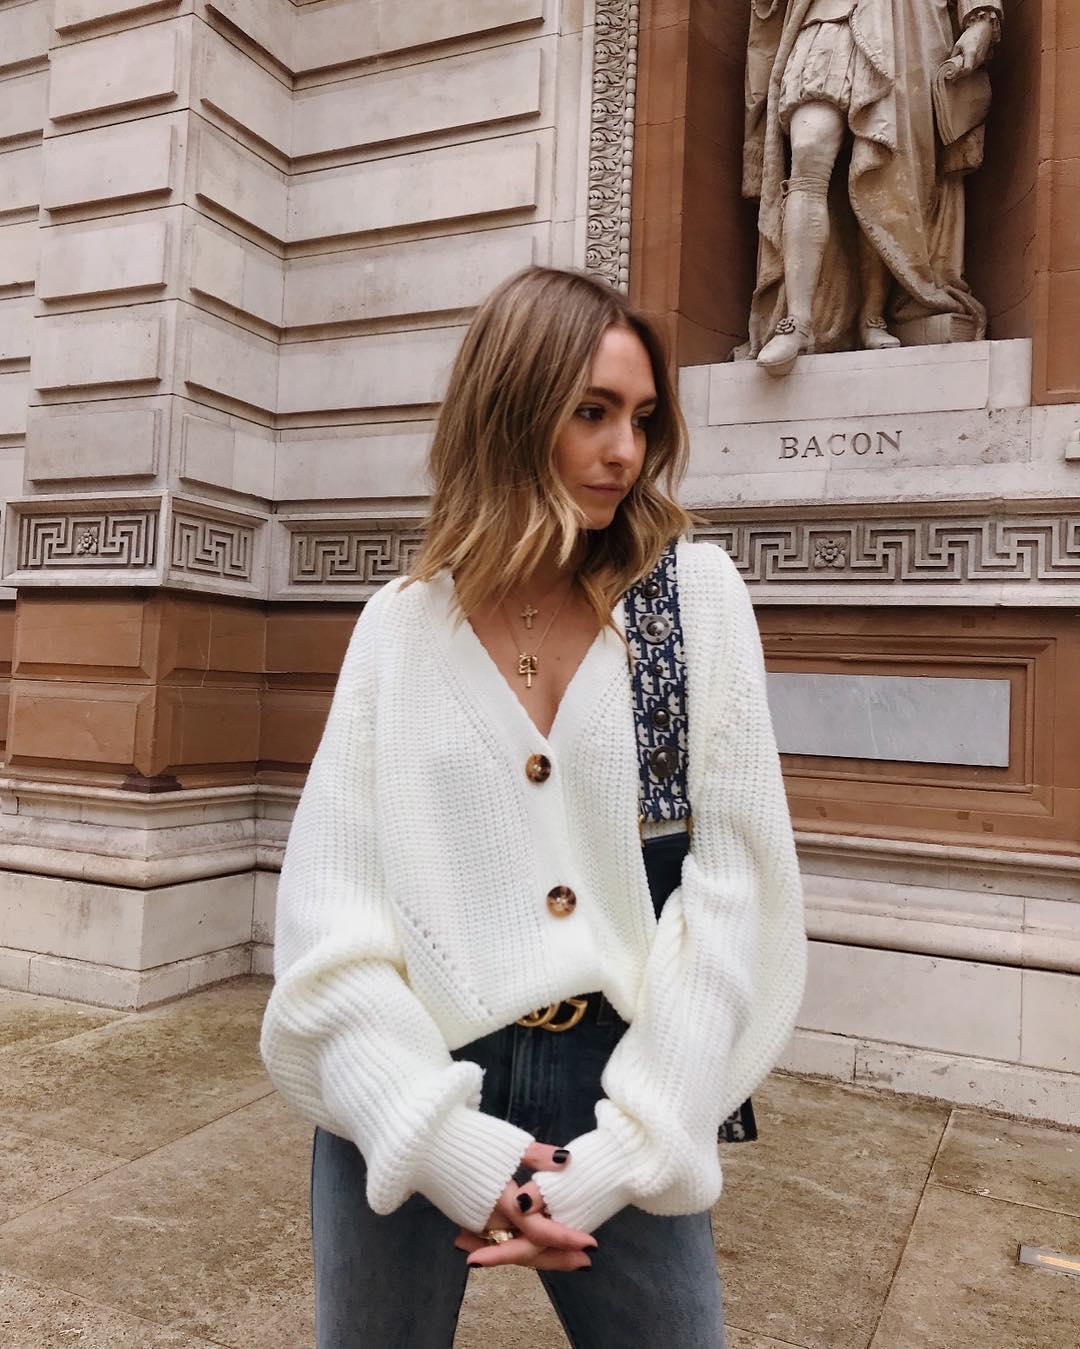 New European Women Autumn Winter Warm Sweaters Split Cardigan Long Sleeve Loose V-neck Button Thicken Cardigan Women Sweaters